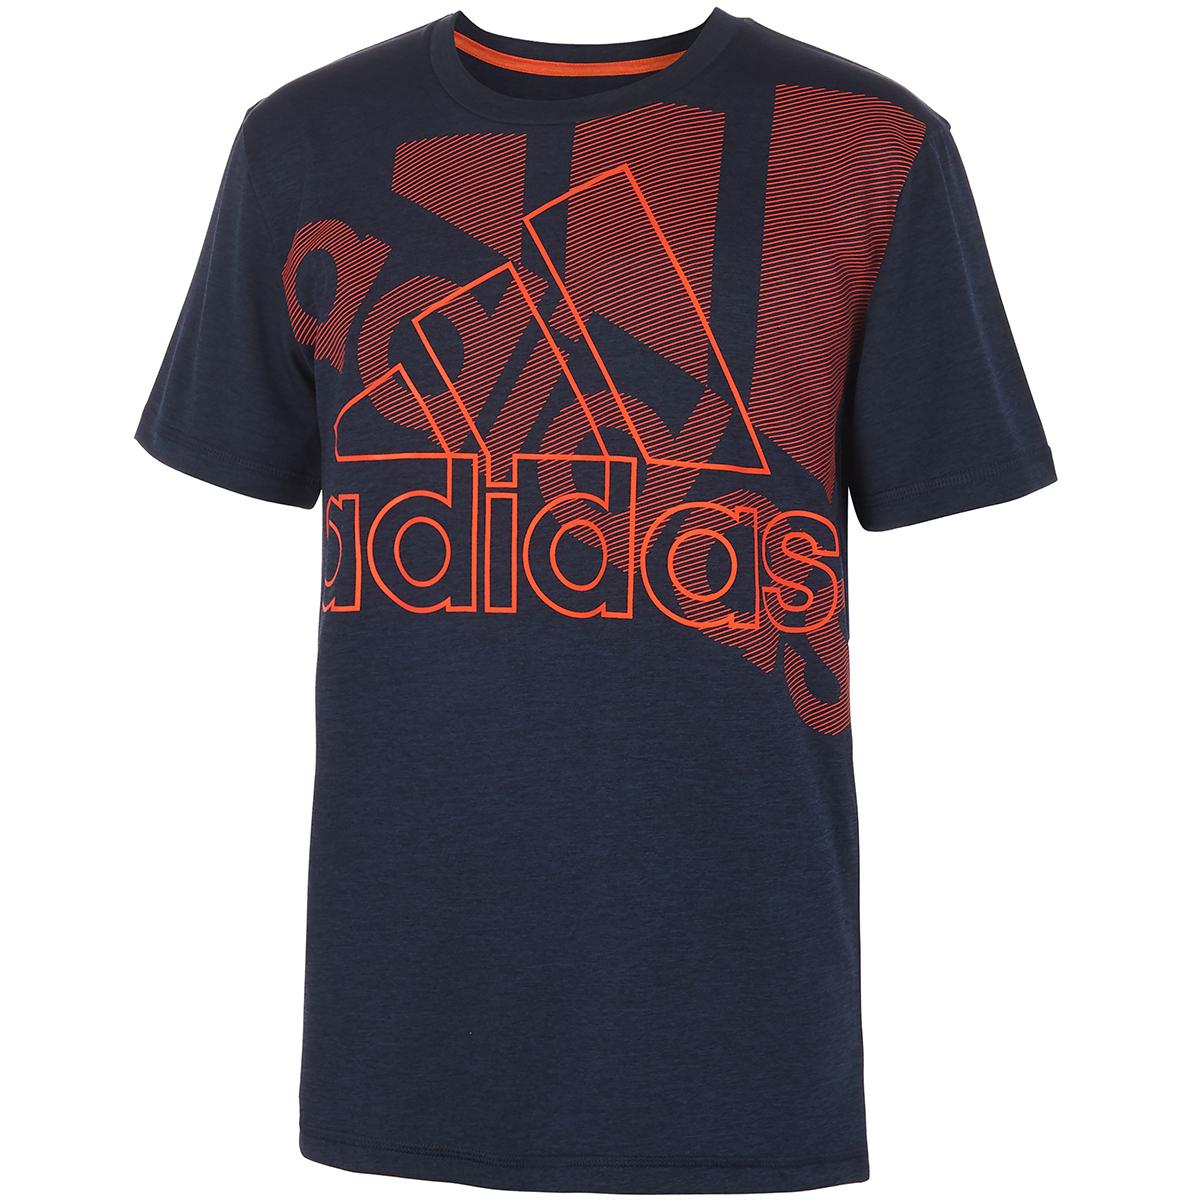 Adidas Boys' Statement Badge Of Sport Short-Sleeve Tee - Blue, XL